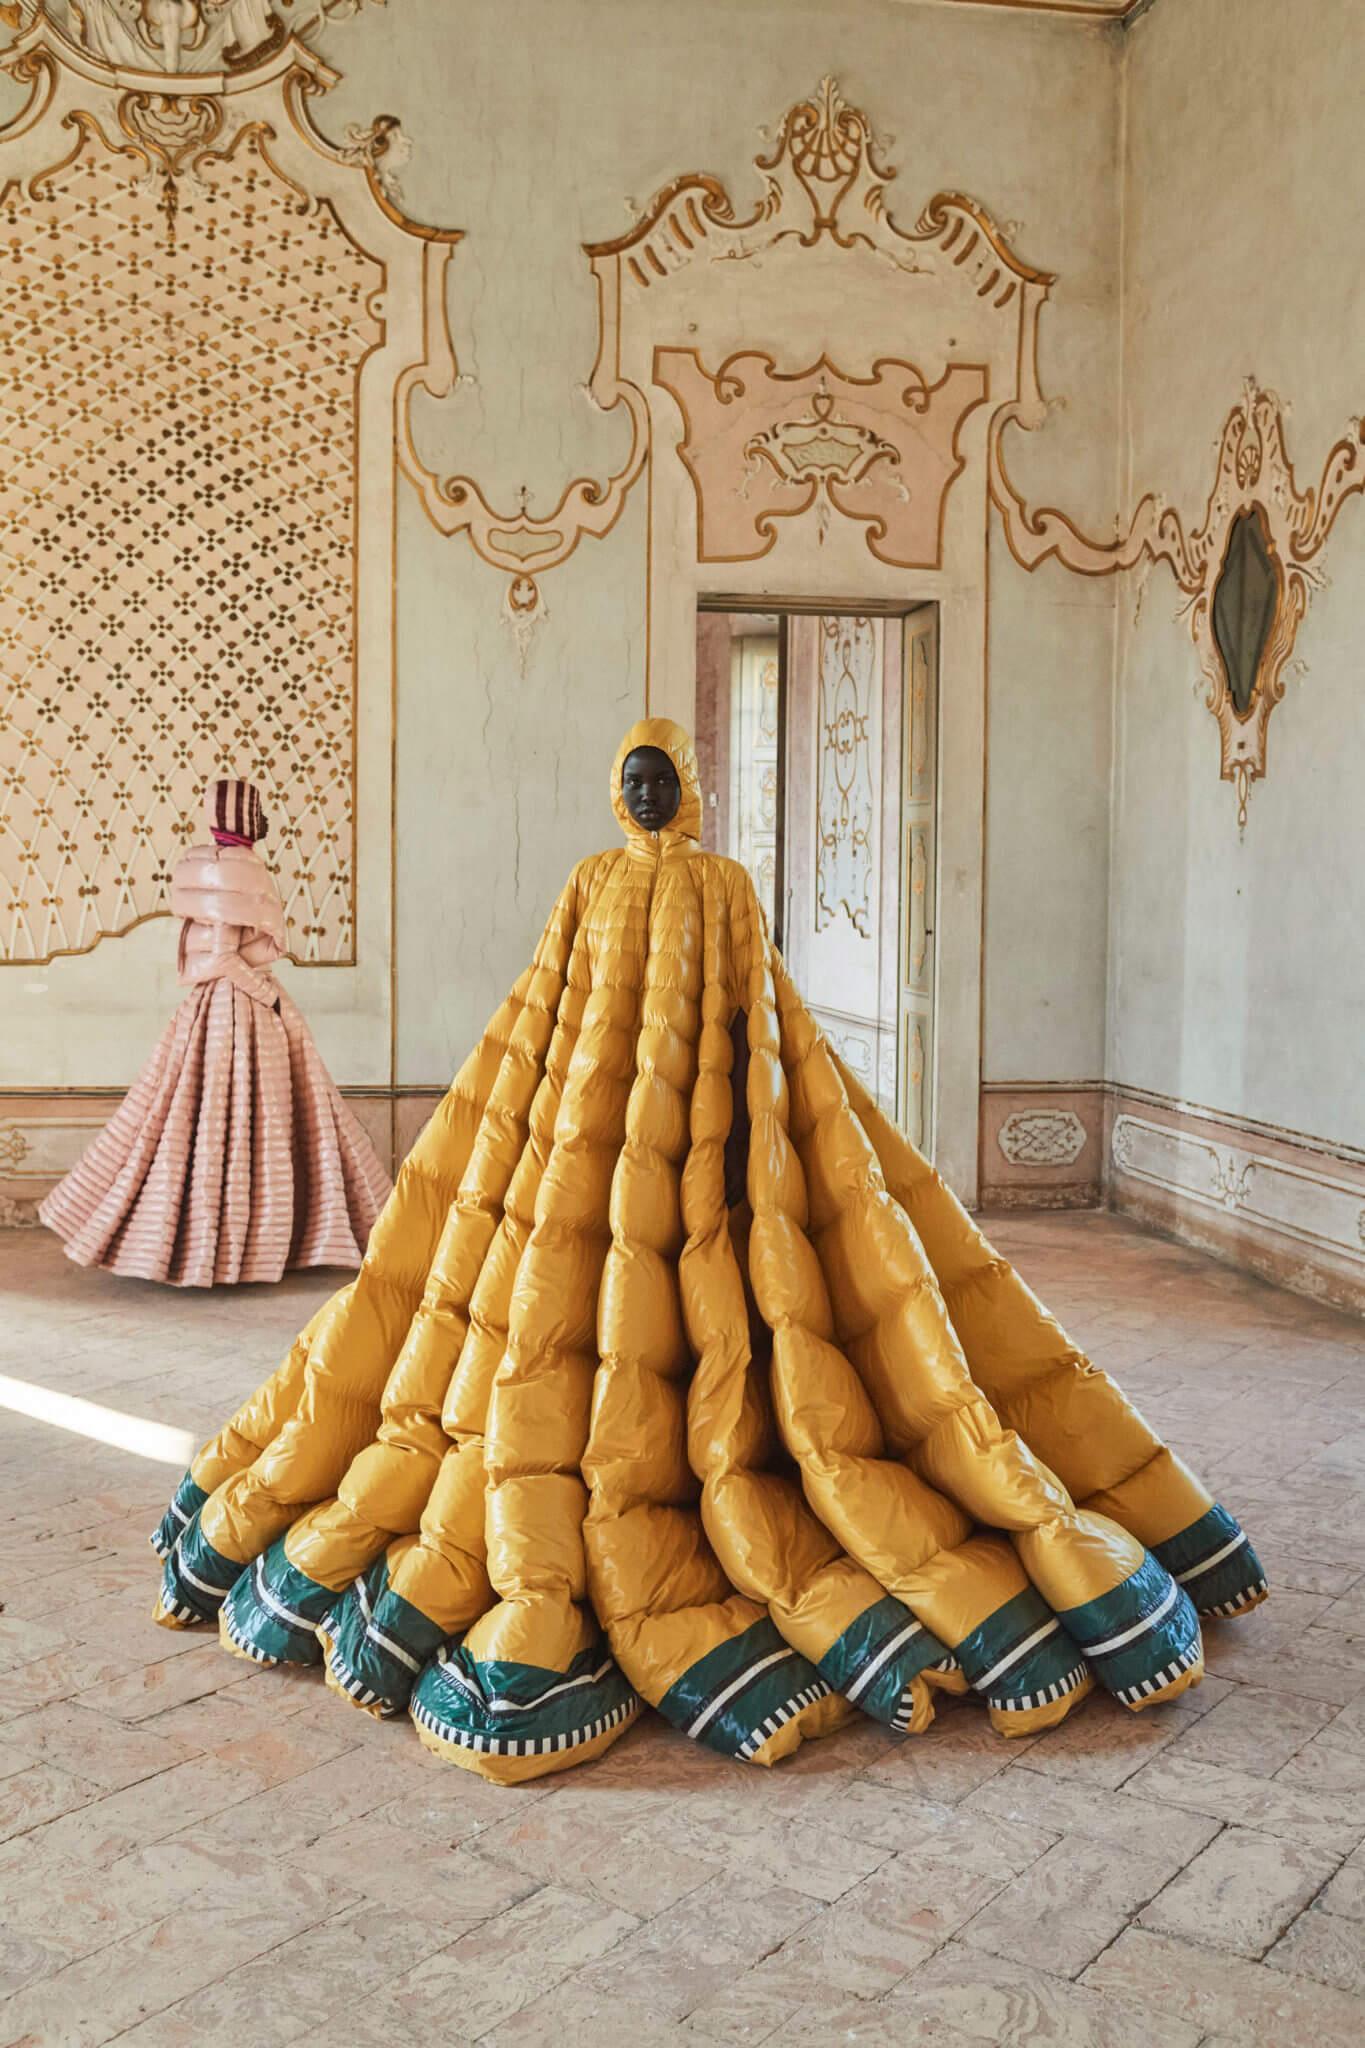 Moncler reinventa la chaqueta puffer con un desfile épico en la Milan Fashion Week